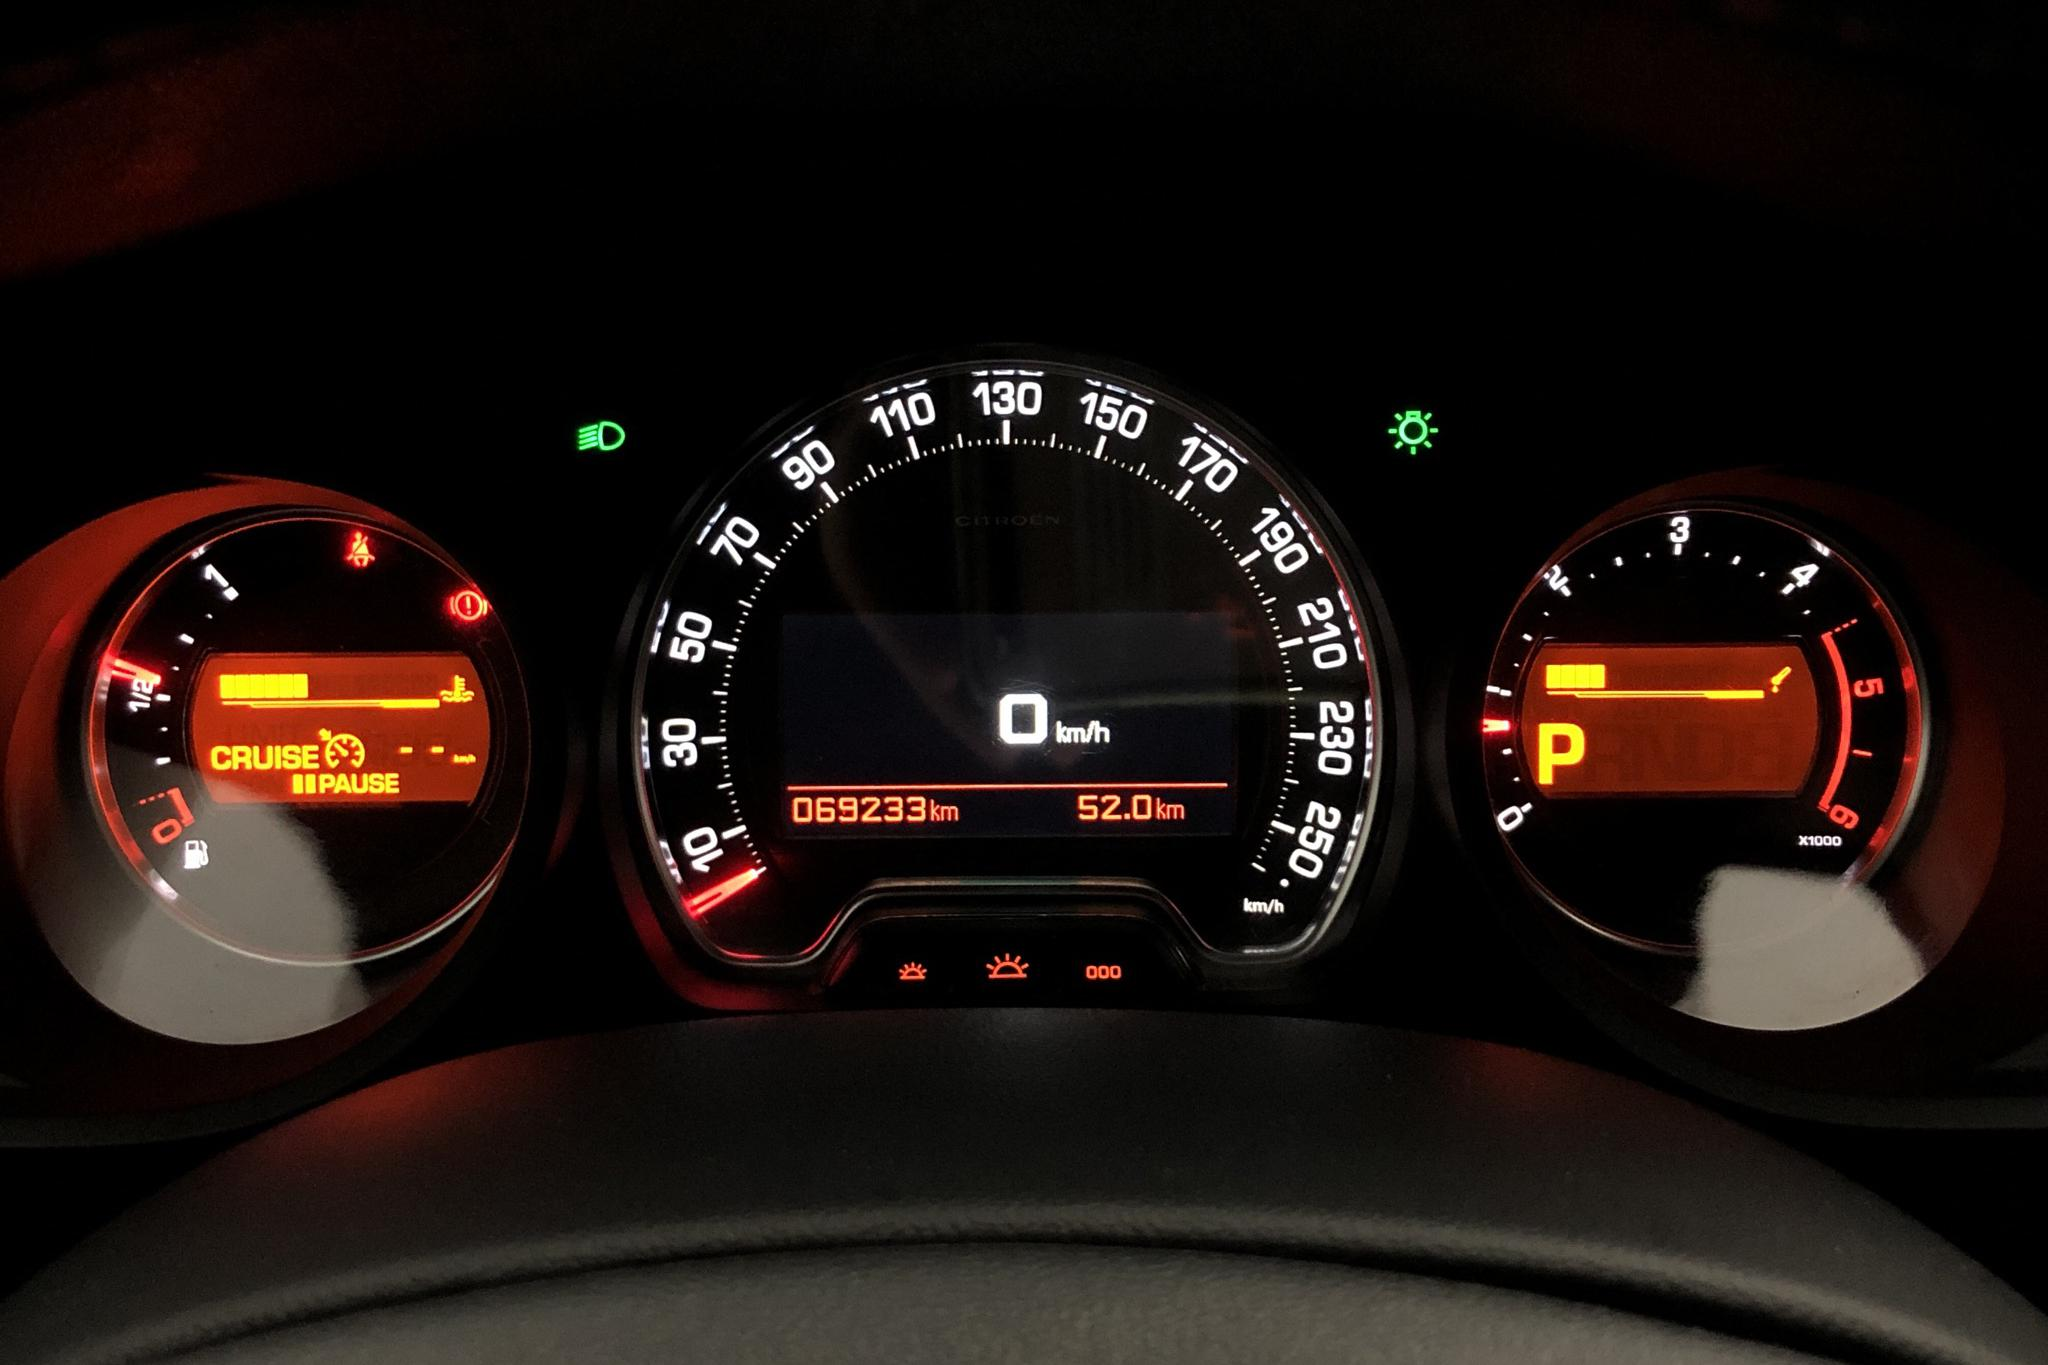 Citroen C5 III 2.0 BlueHDi Tourer (180hk) - 69 230 km - Automatic - blue - 2016